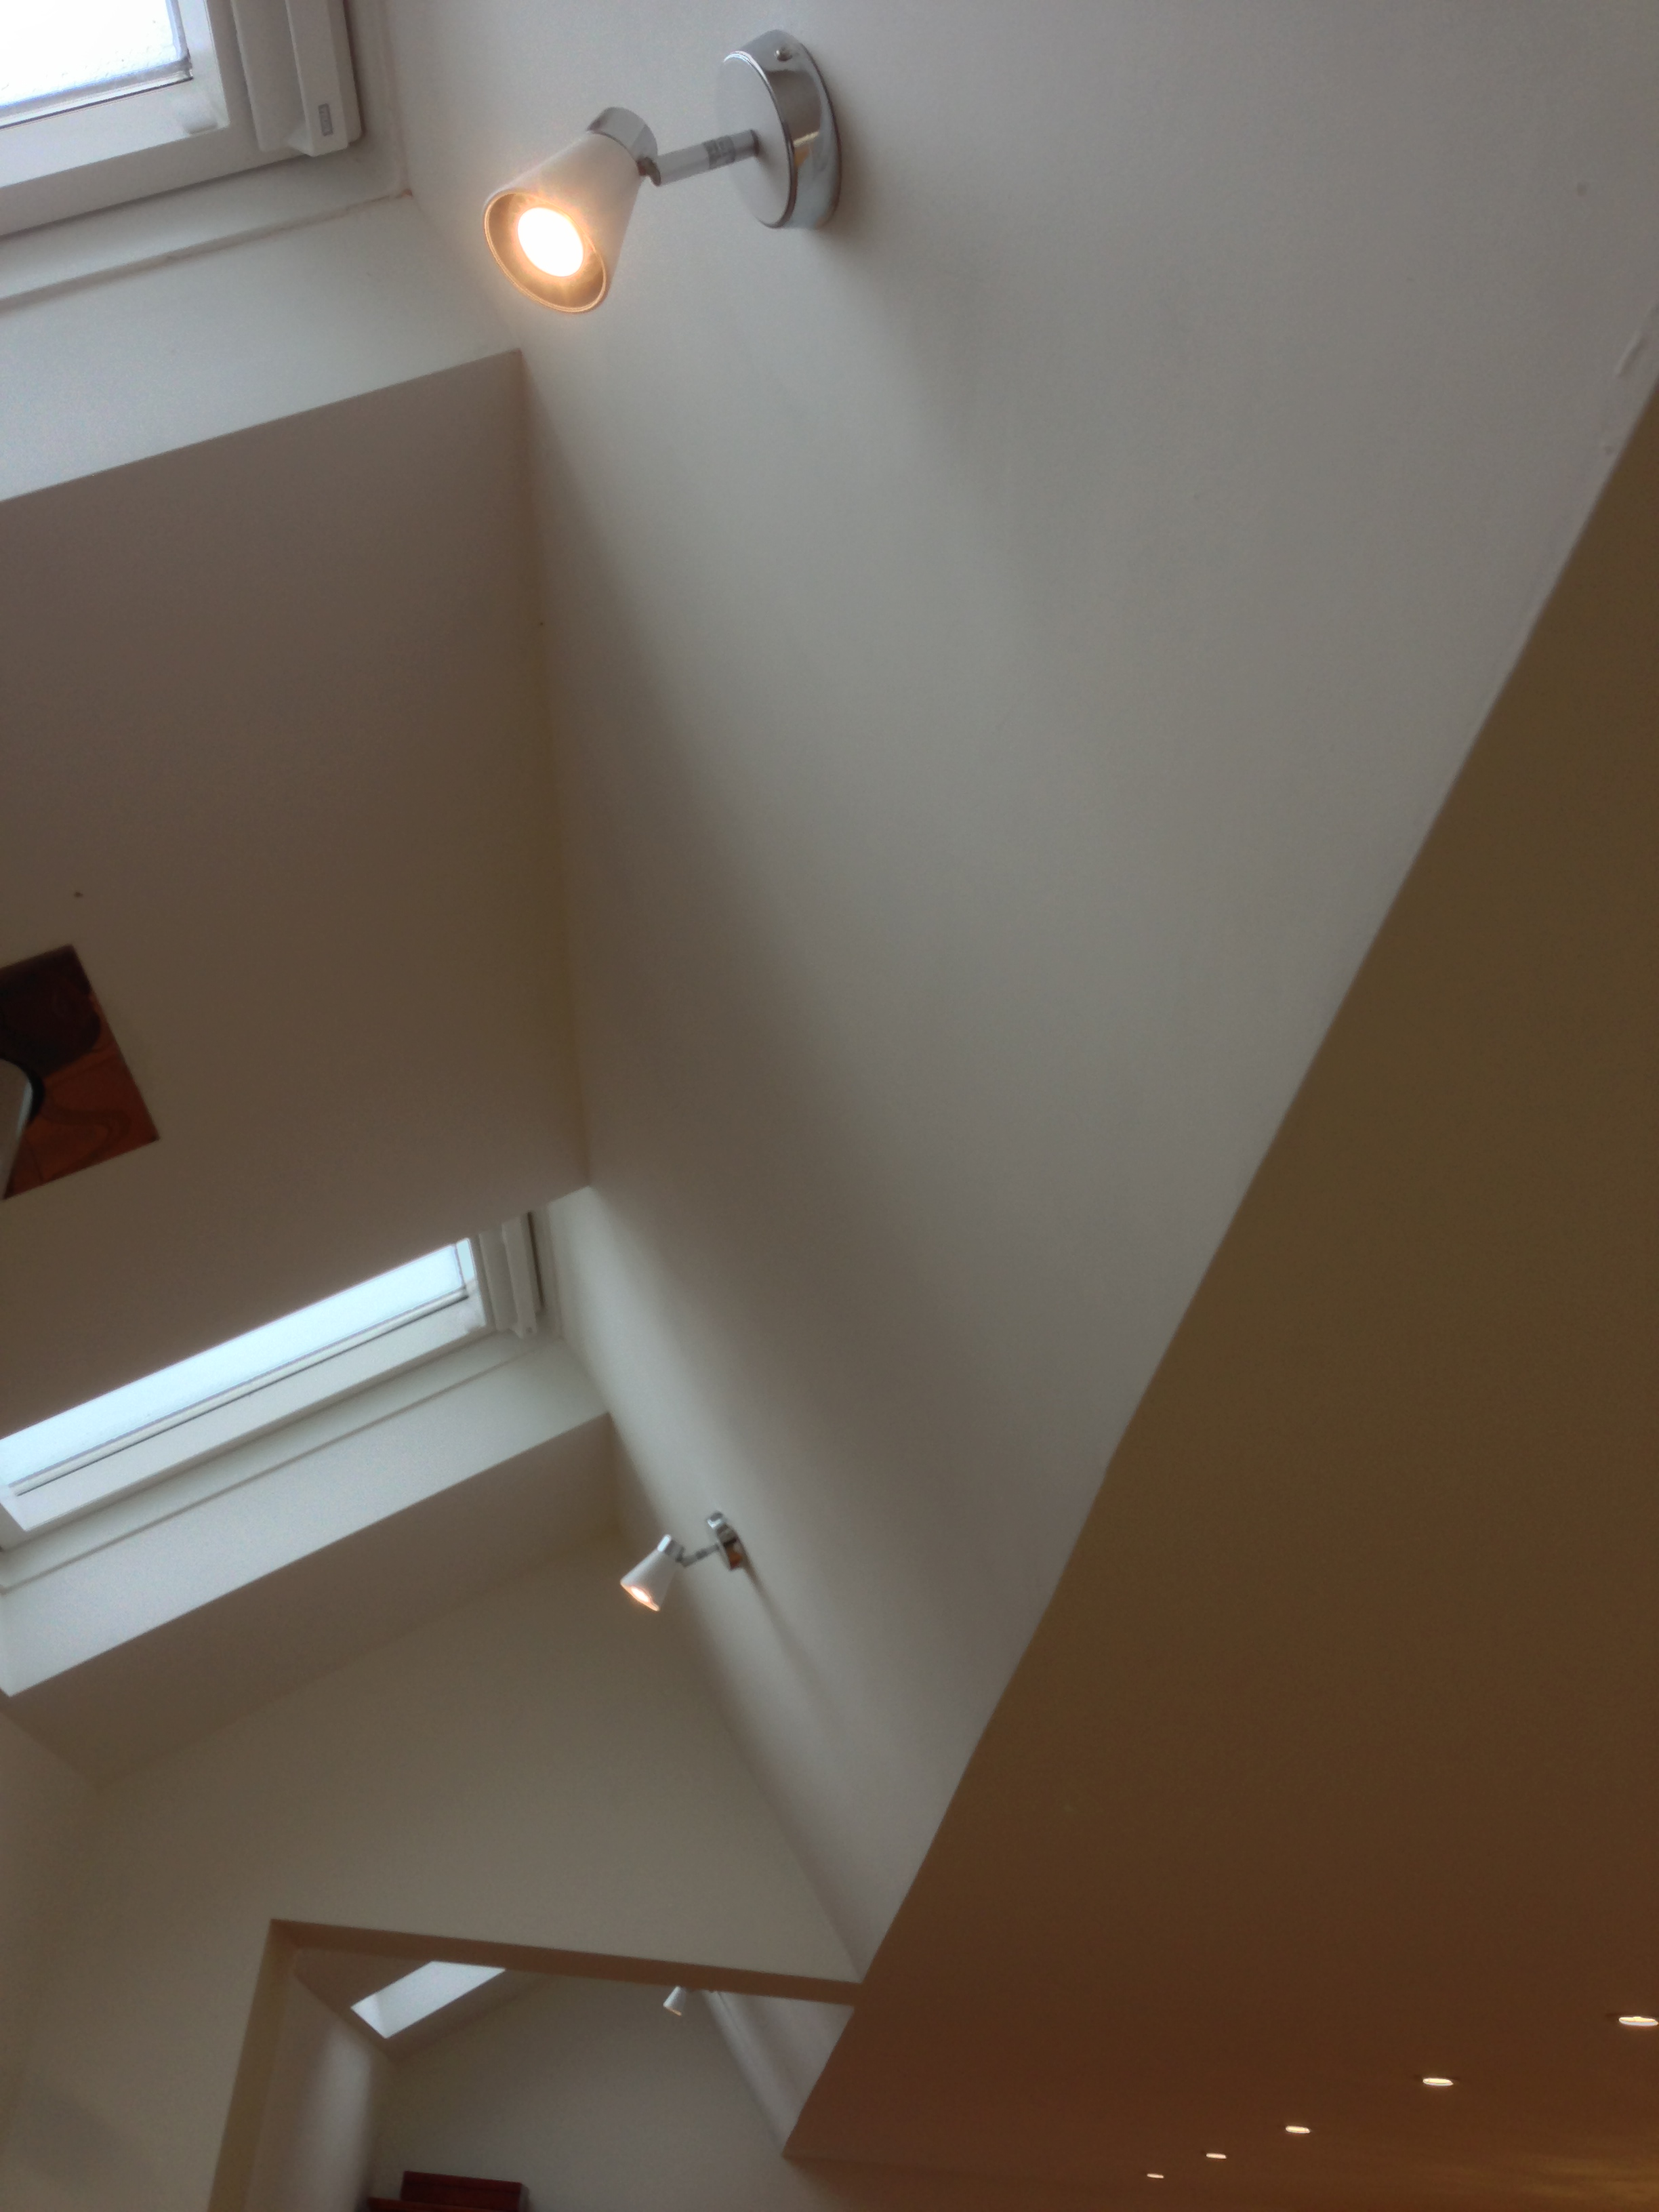 Spot Lights (renovation/rewire)